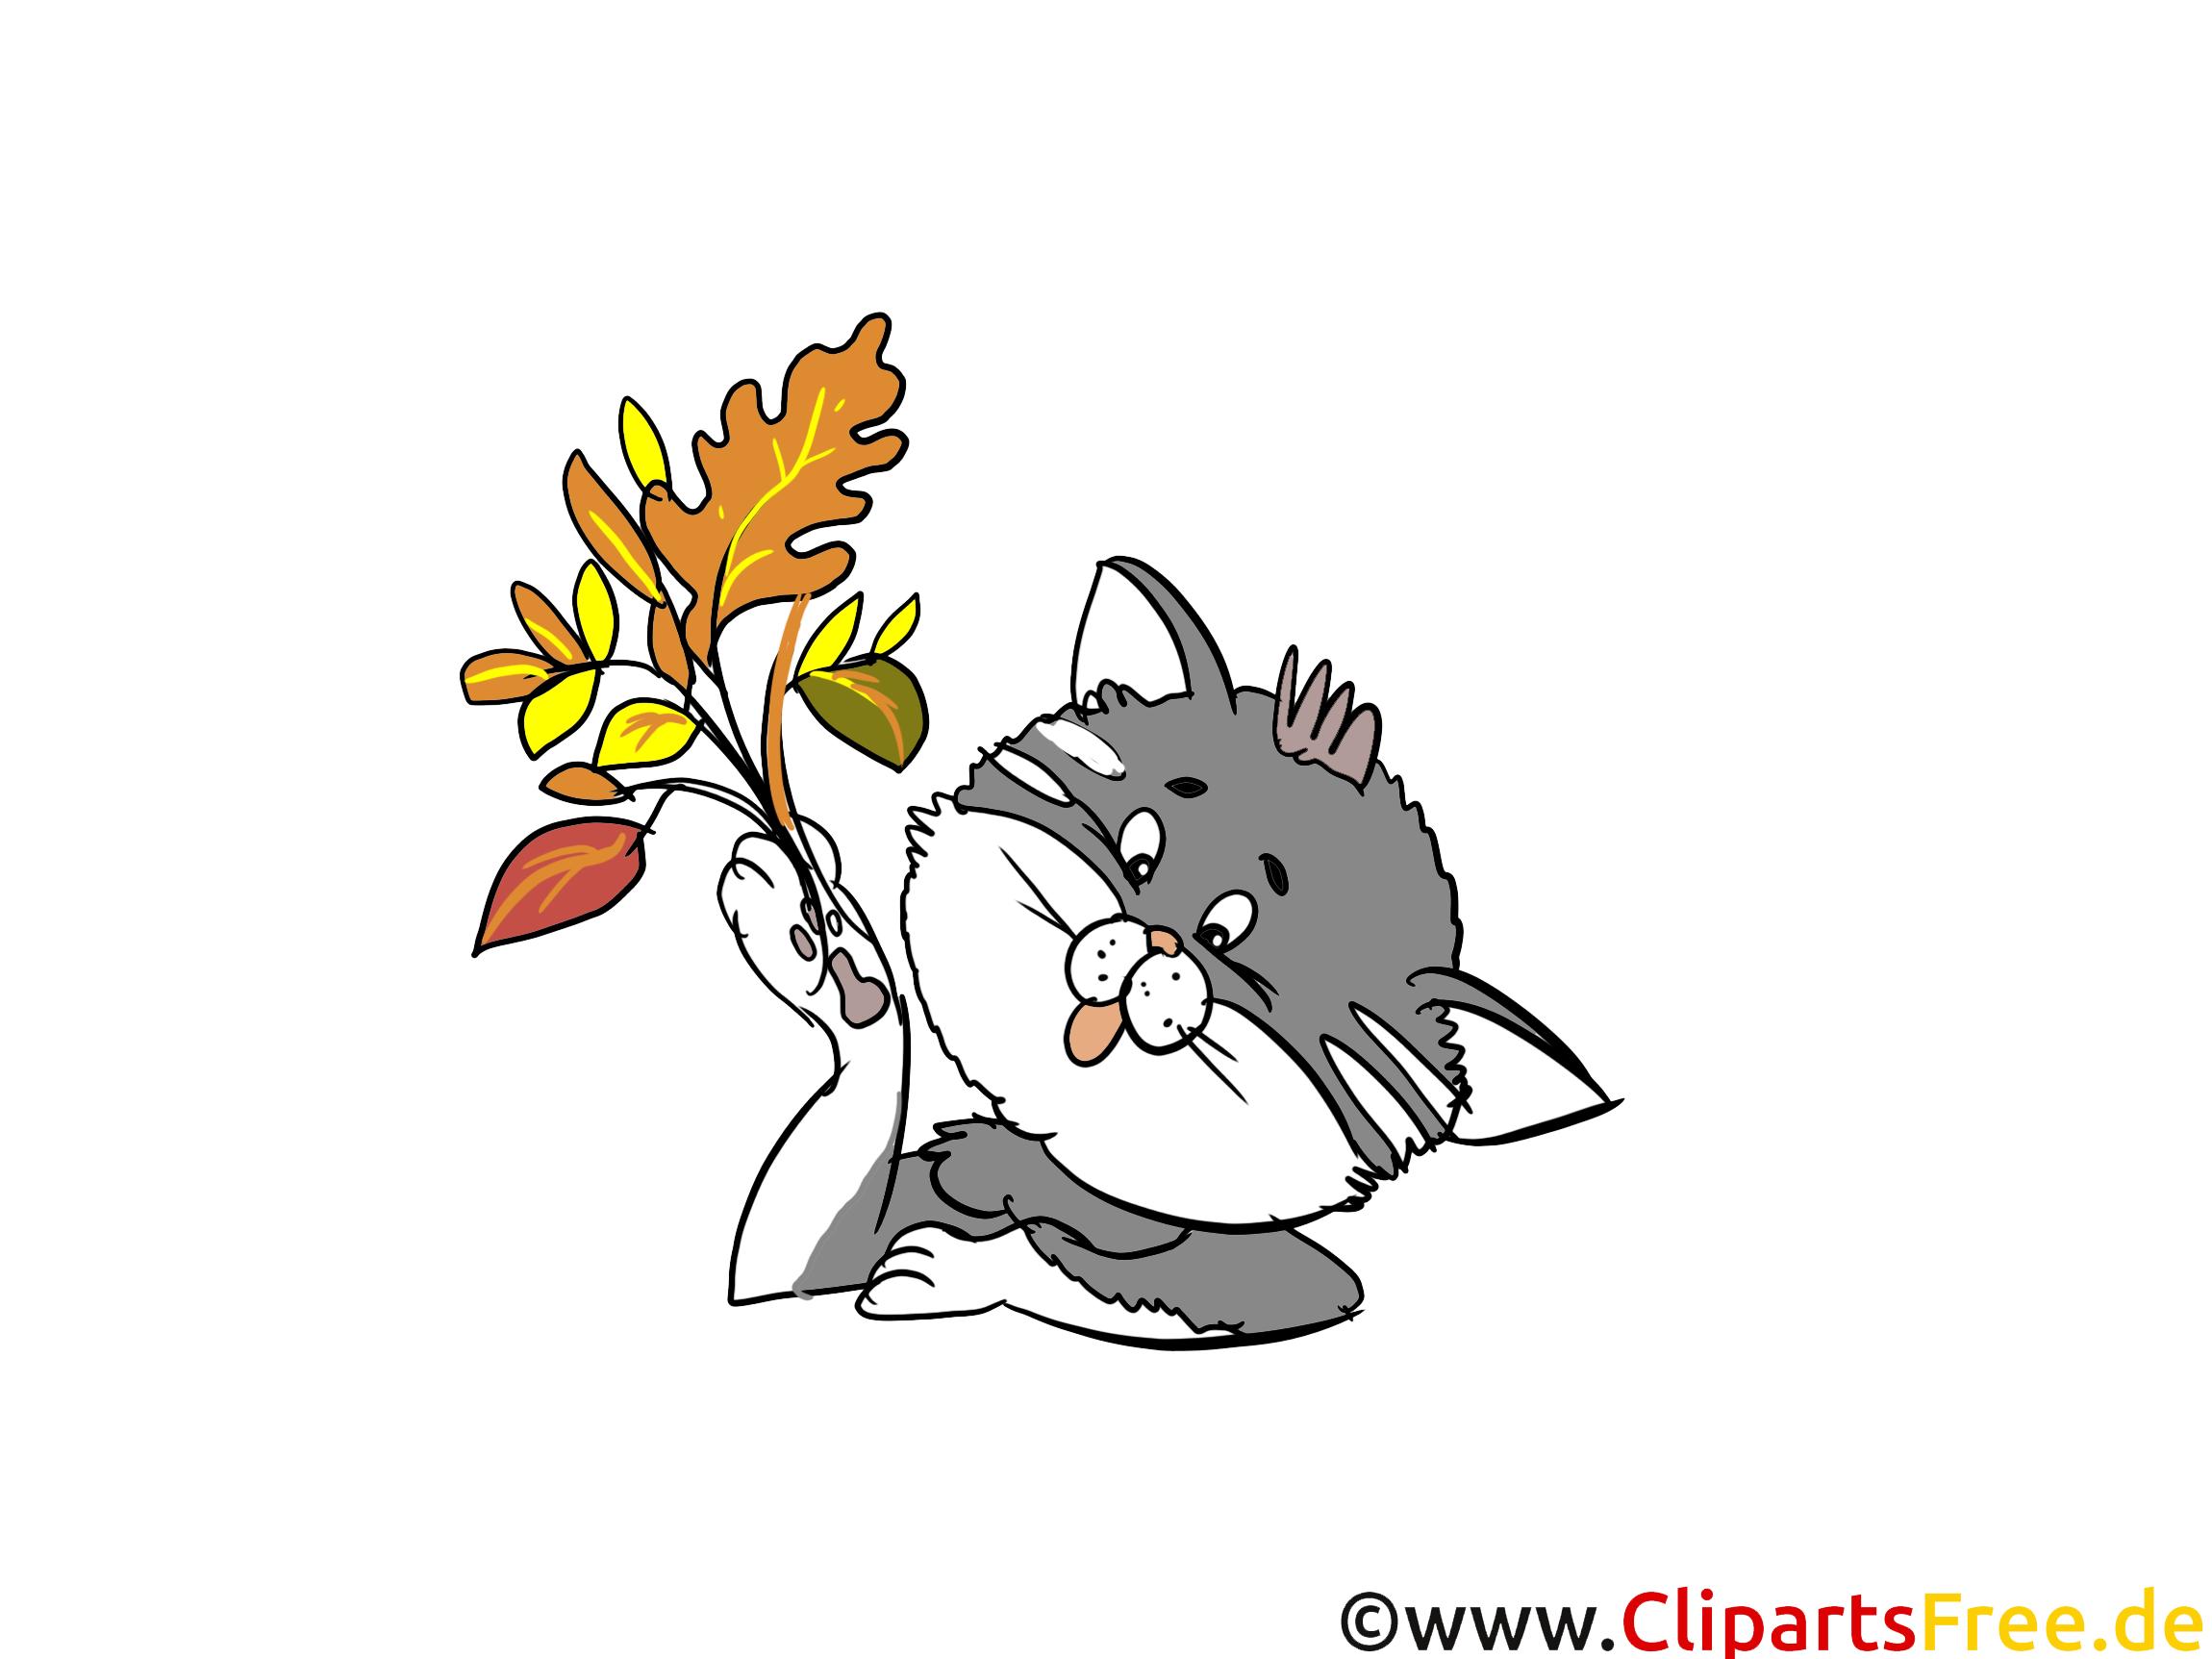 Comic-Bild Katze gratis